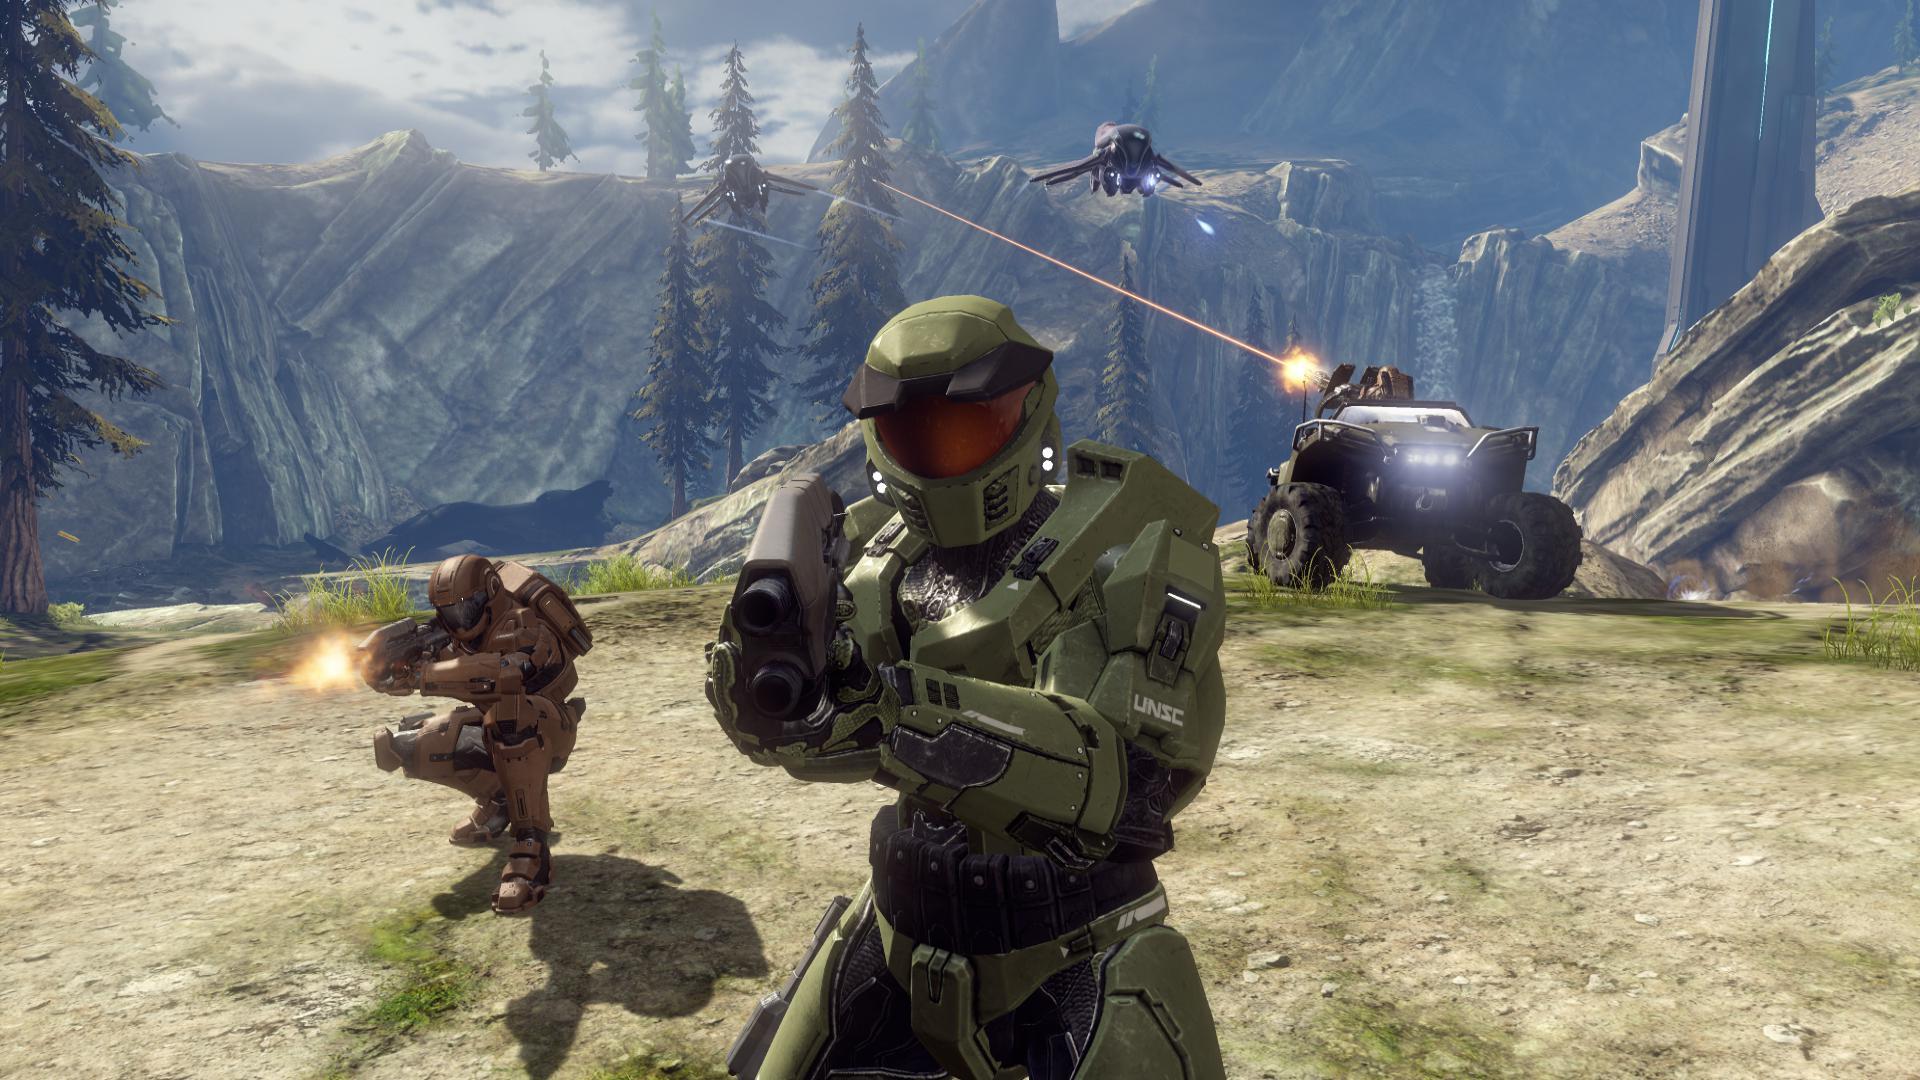 Halo Combat Evolved In 4